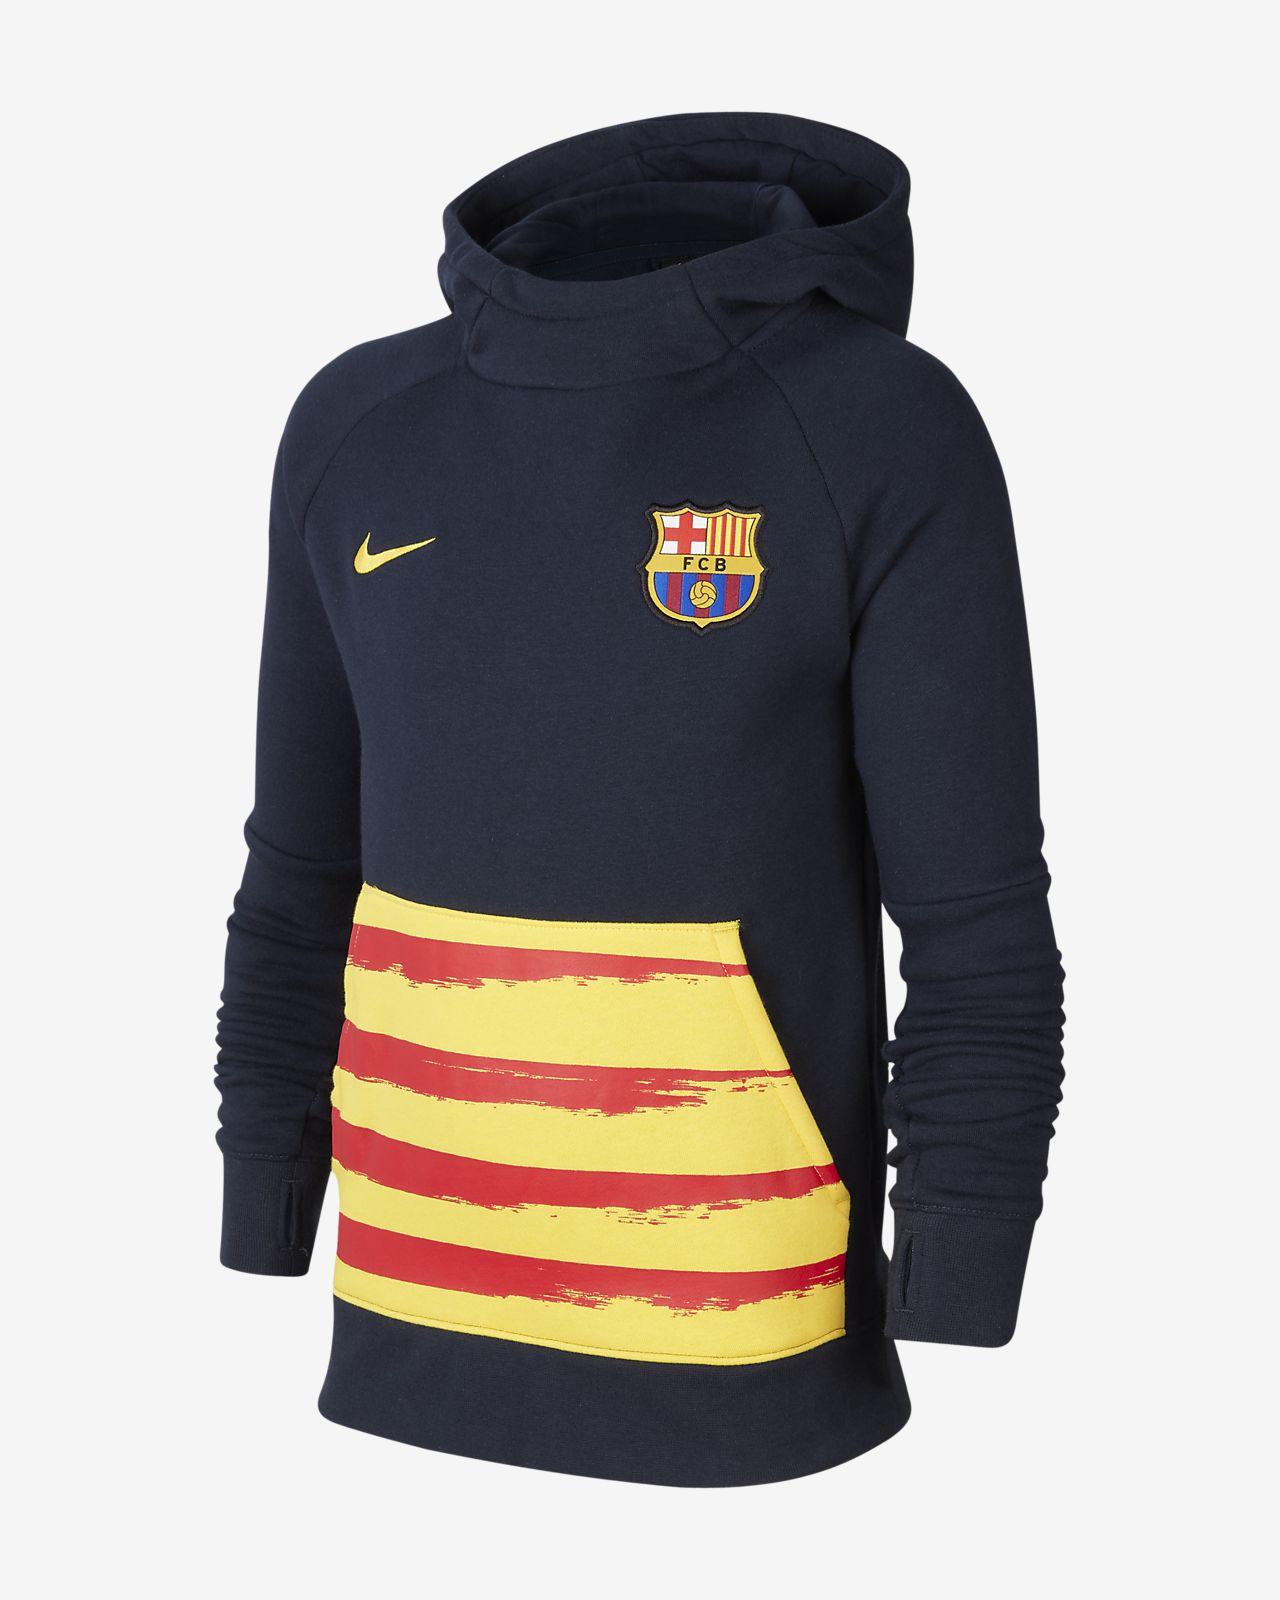 FC Barcelona Older Kids' Fleece Pullover Football Hoodie